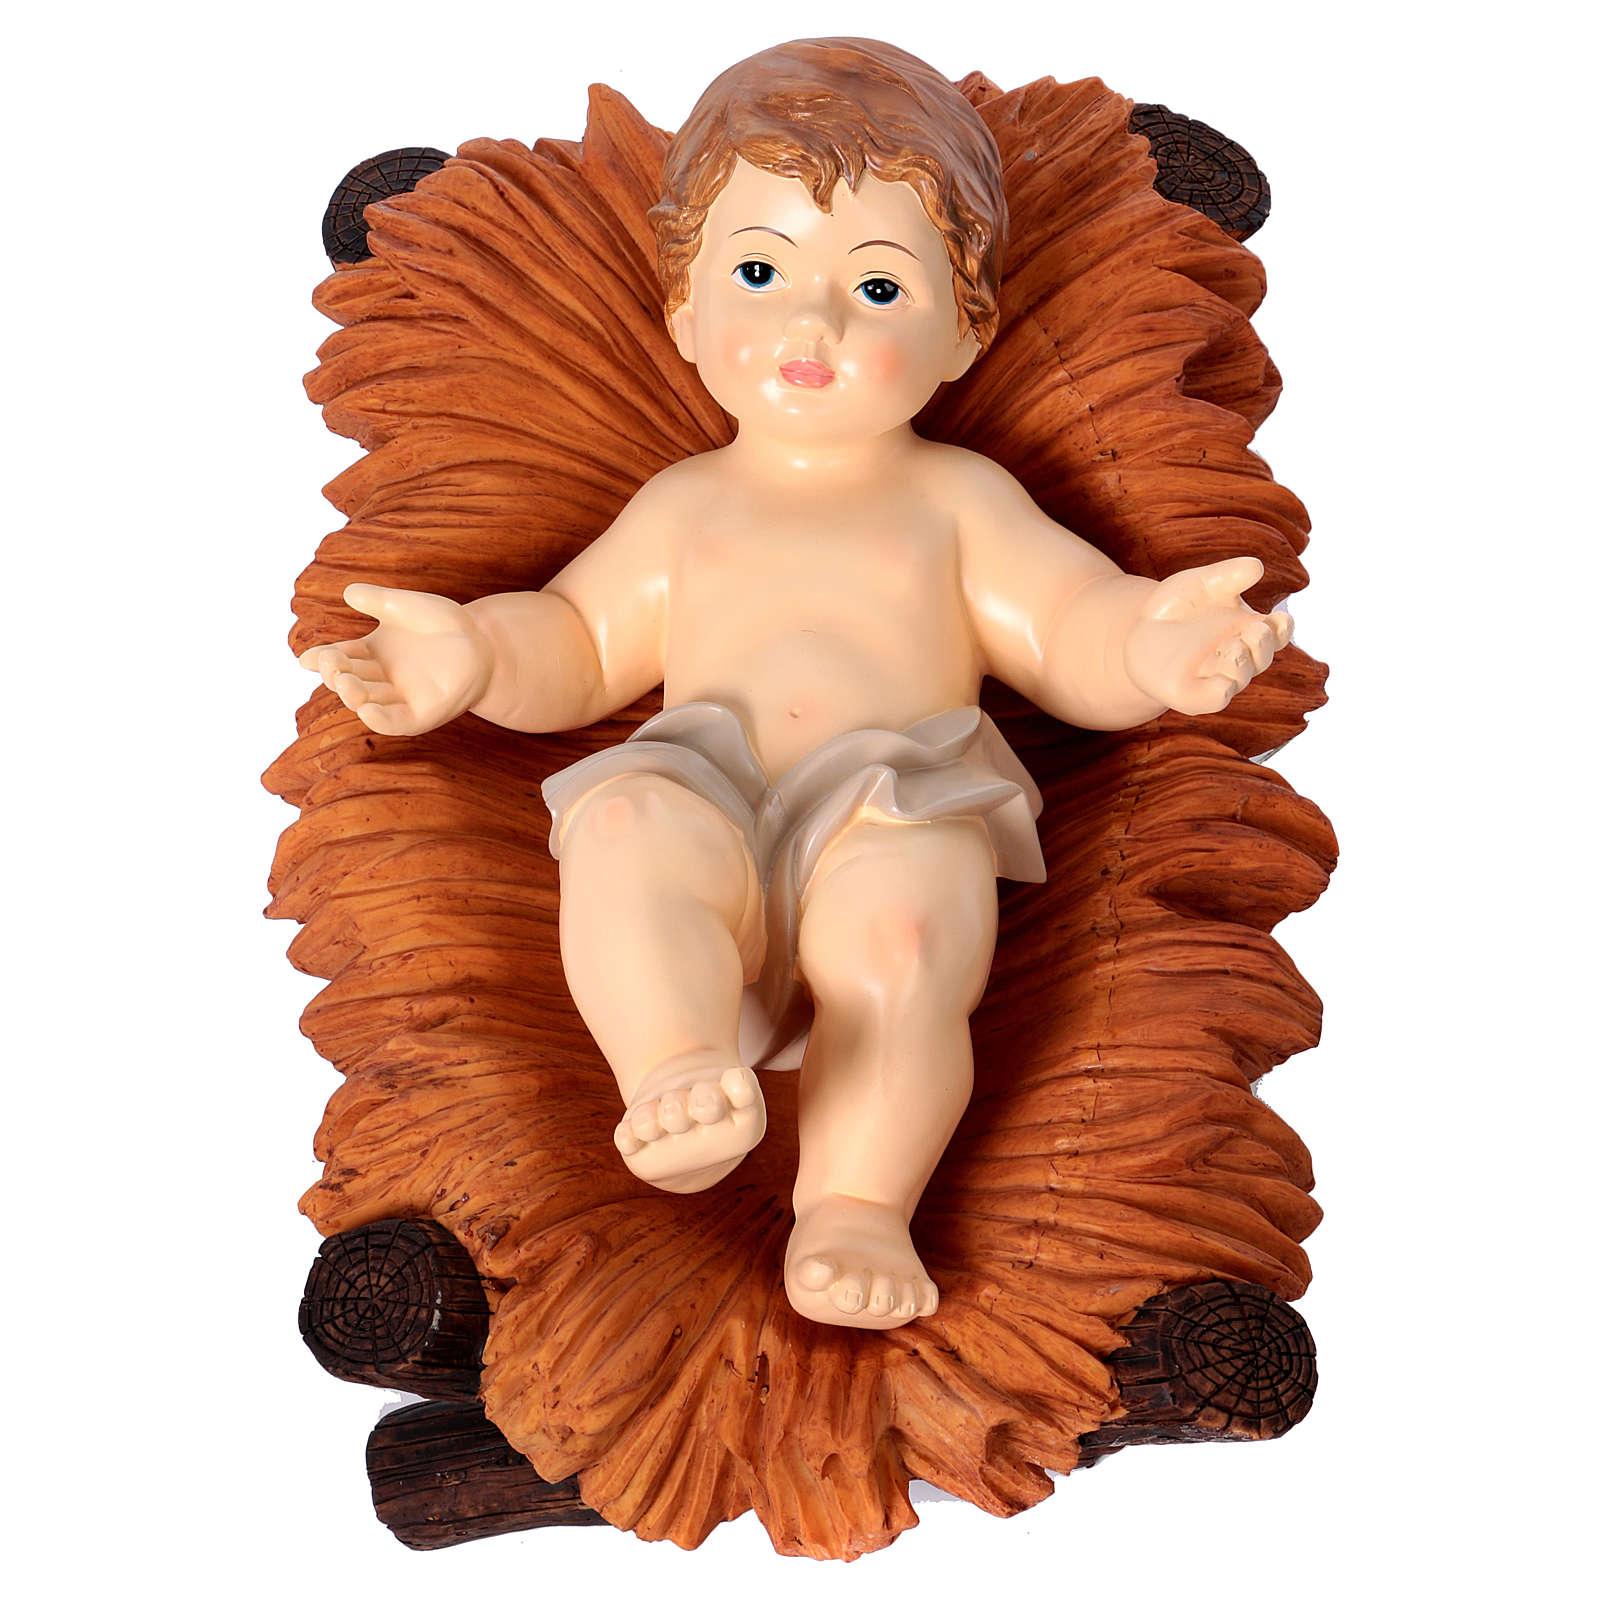 Natividade Resina Pintada 100 cm 5 Figuras 3